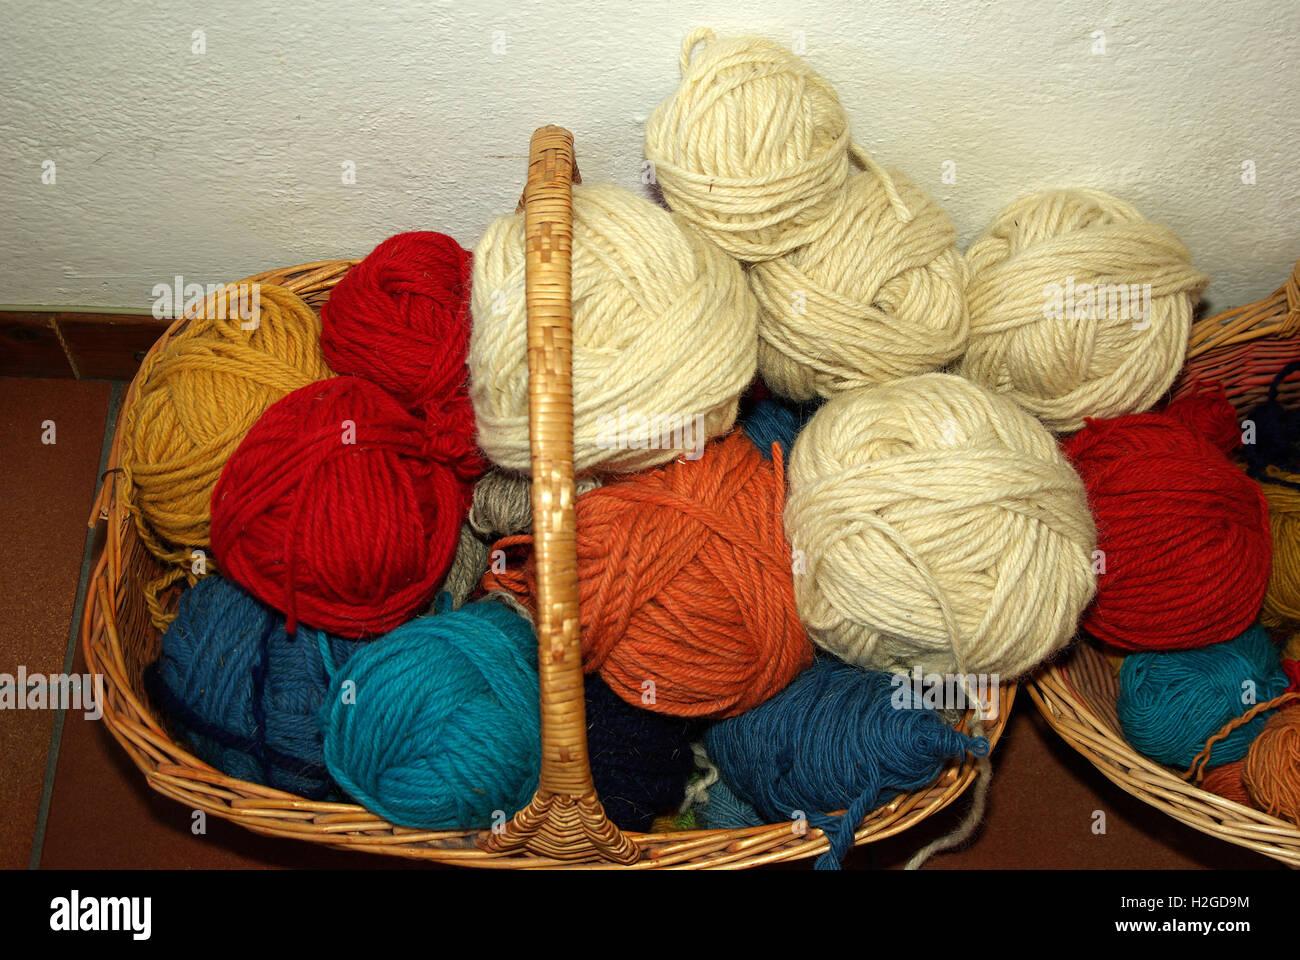 Skein of wool - Stock Image